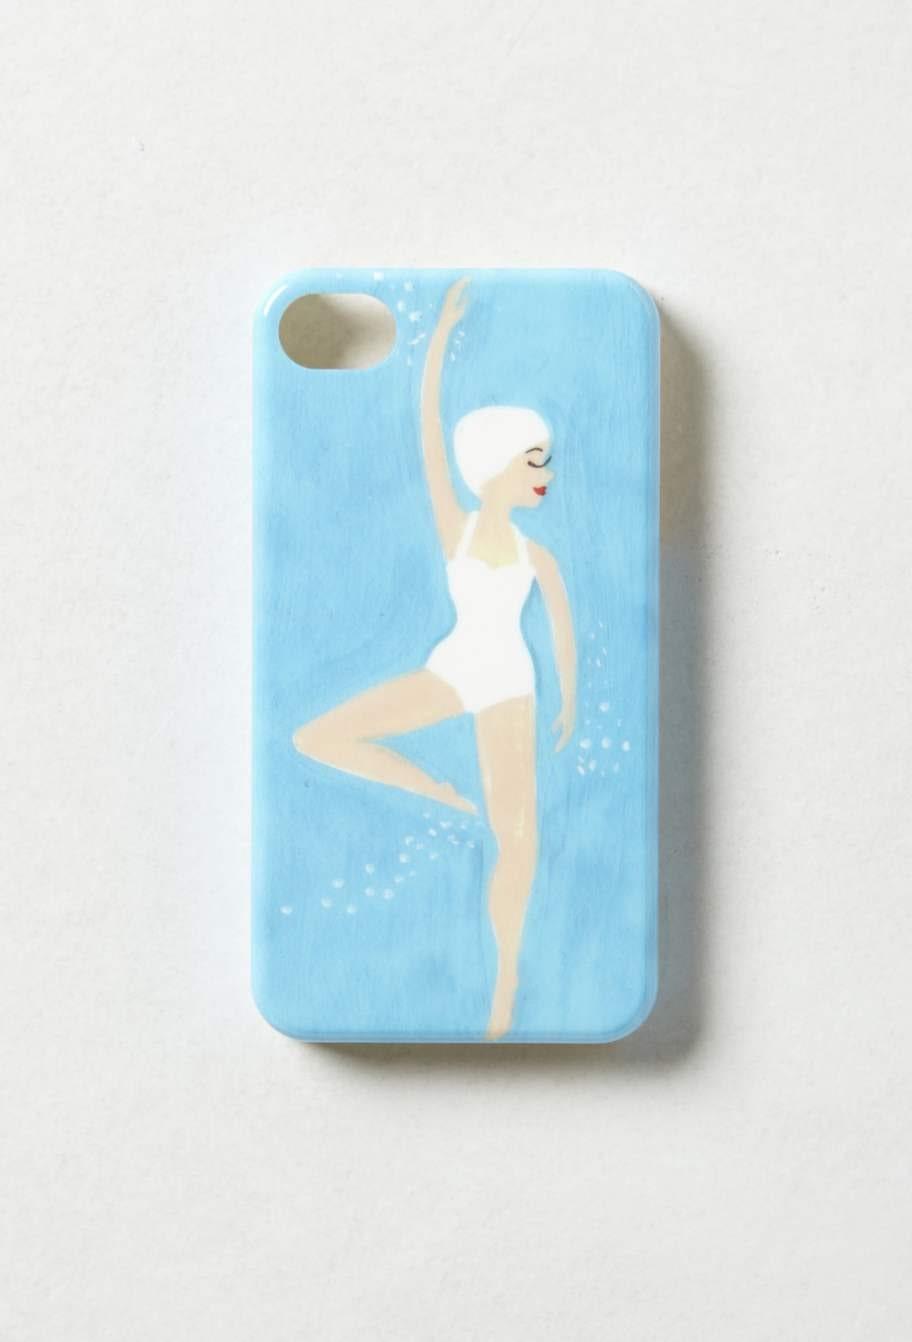 Dansant. Snyggt mobilskal, Synchronicity, till Iphone 4, 245 kronor, Anthropologie.